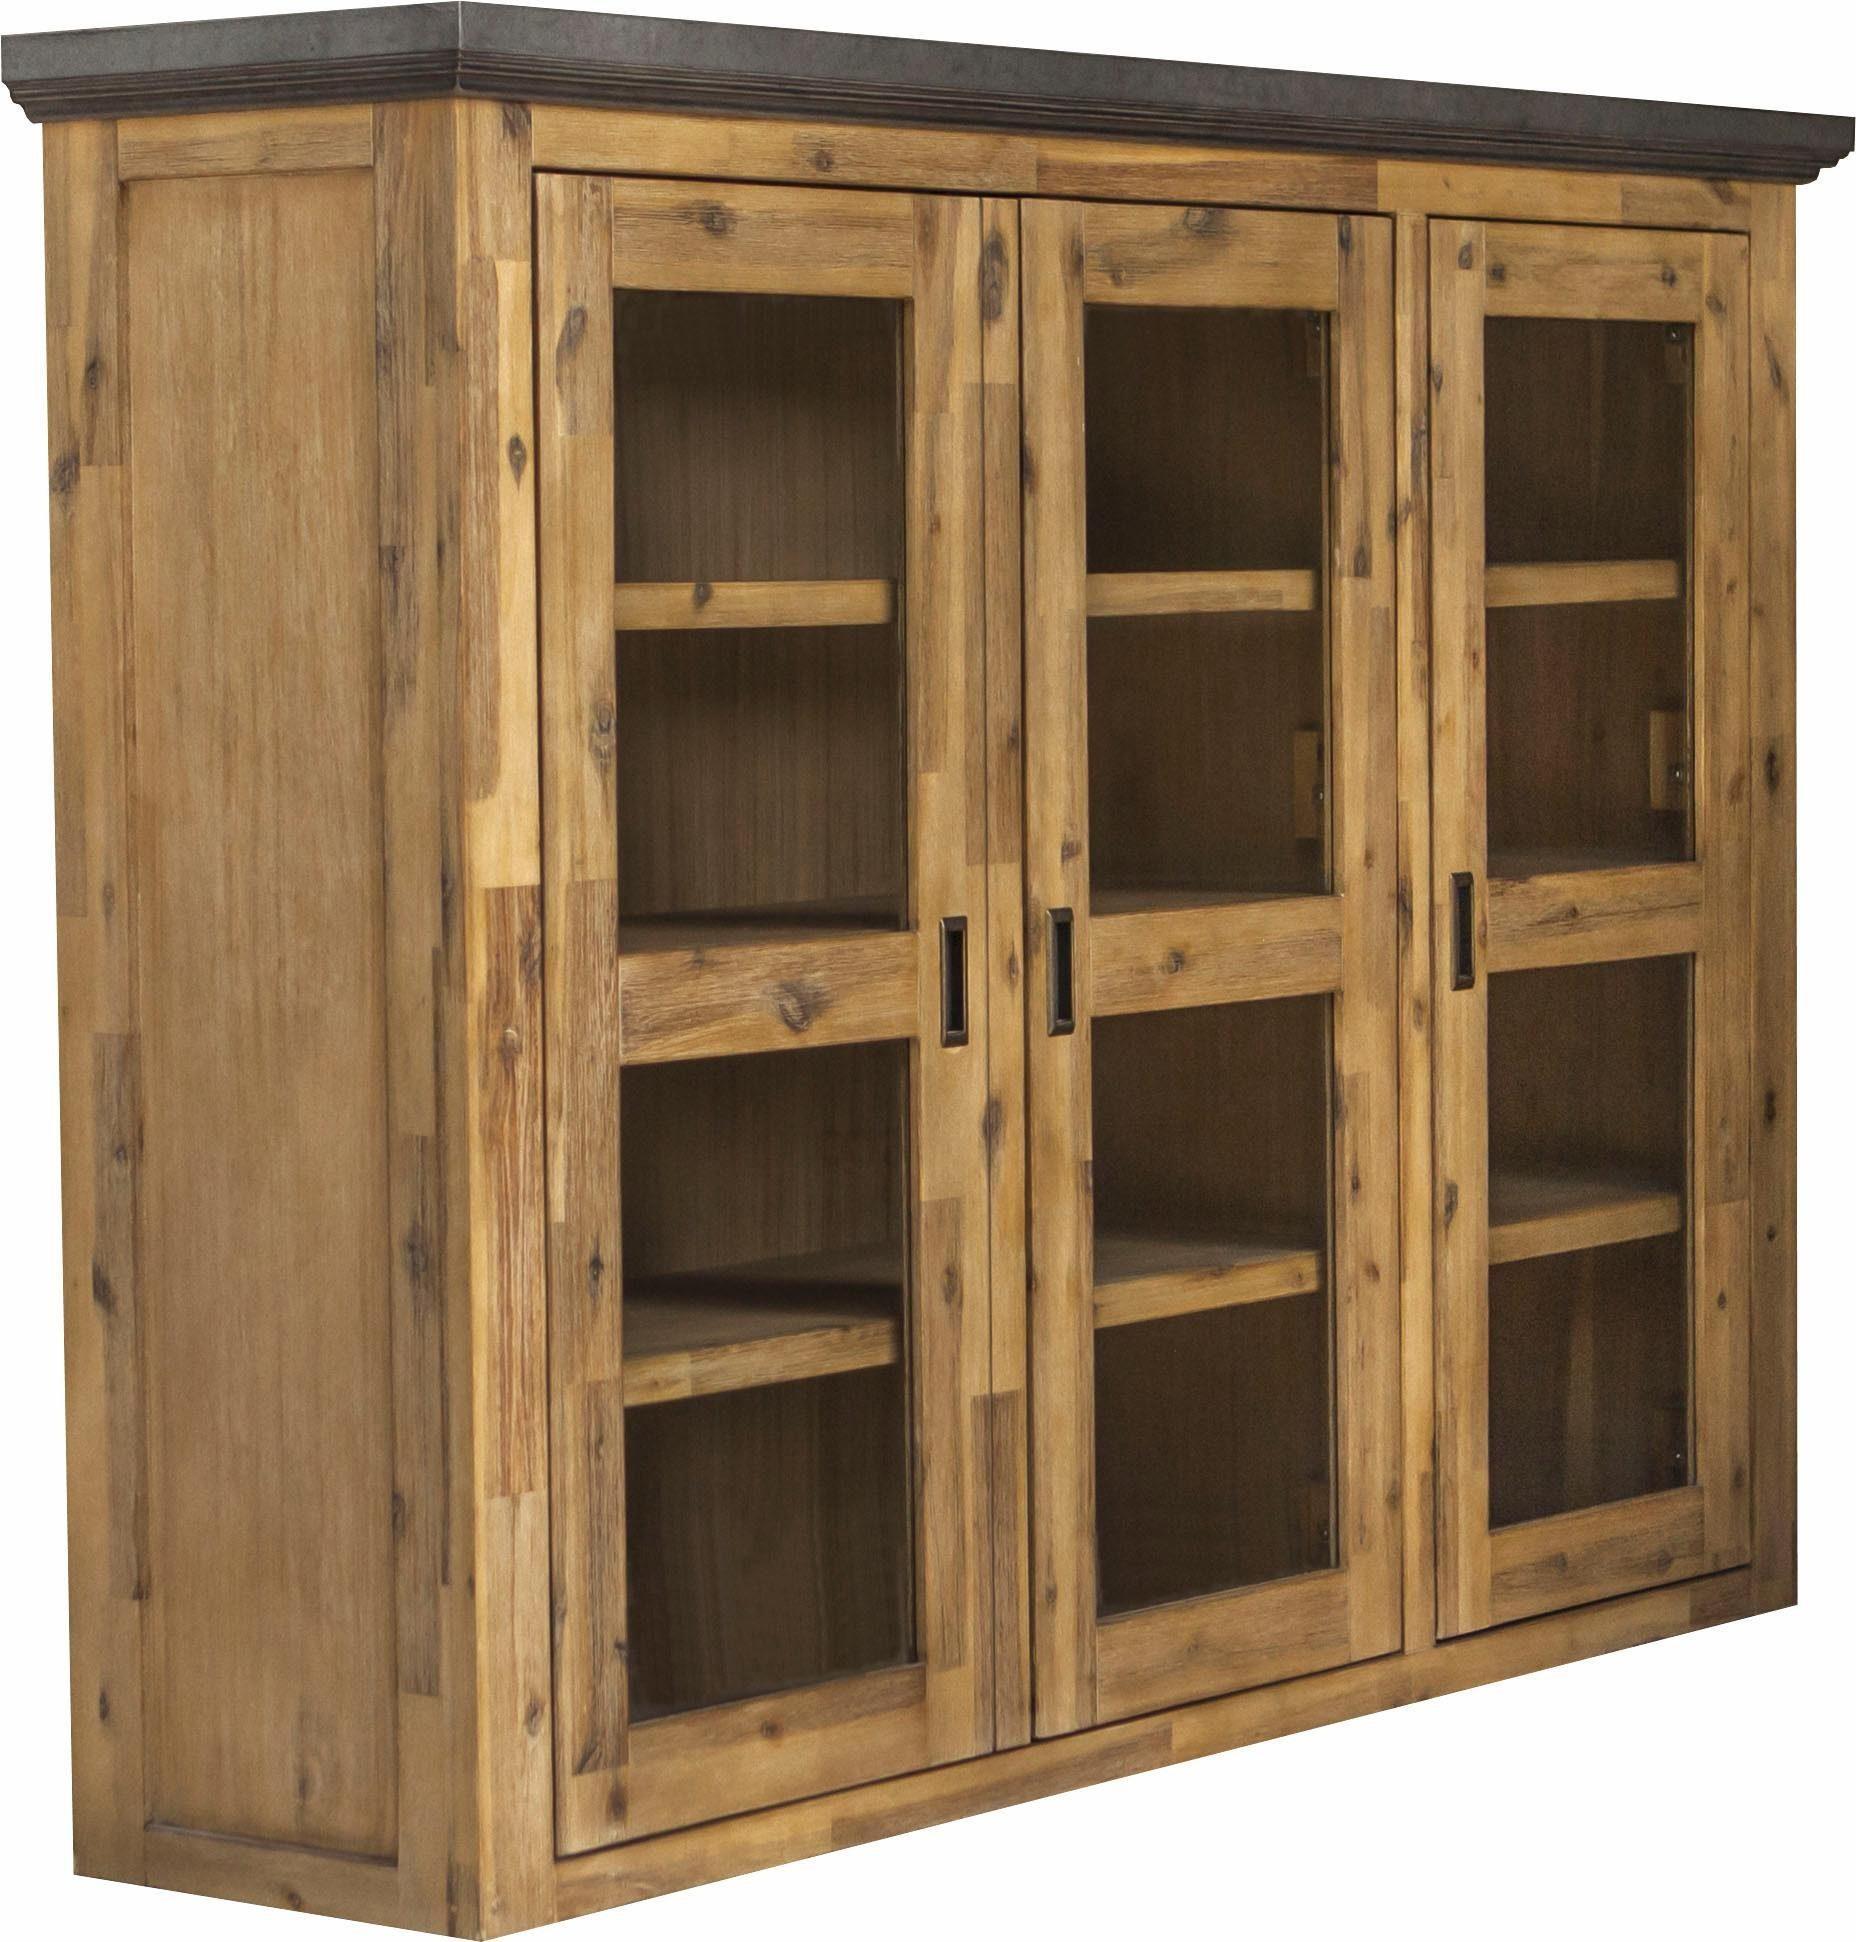 Quadrato Vitrinenaufsatz »Panama« aus gebürsteten Akazienholz, Türen, Top-/Fußleiste in Betonoptik